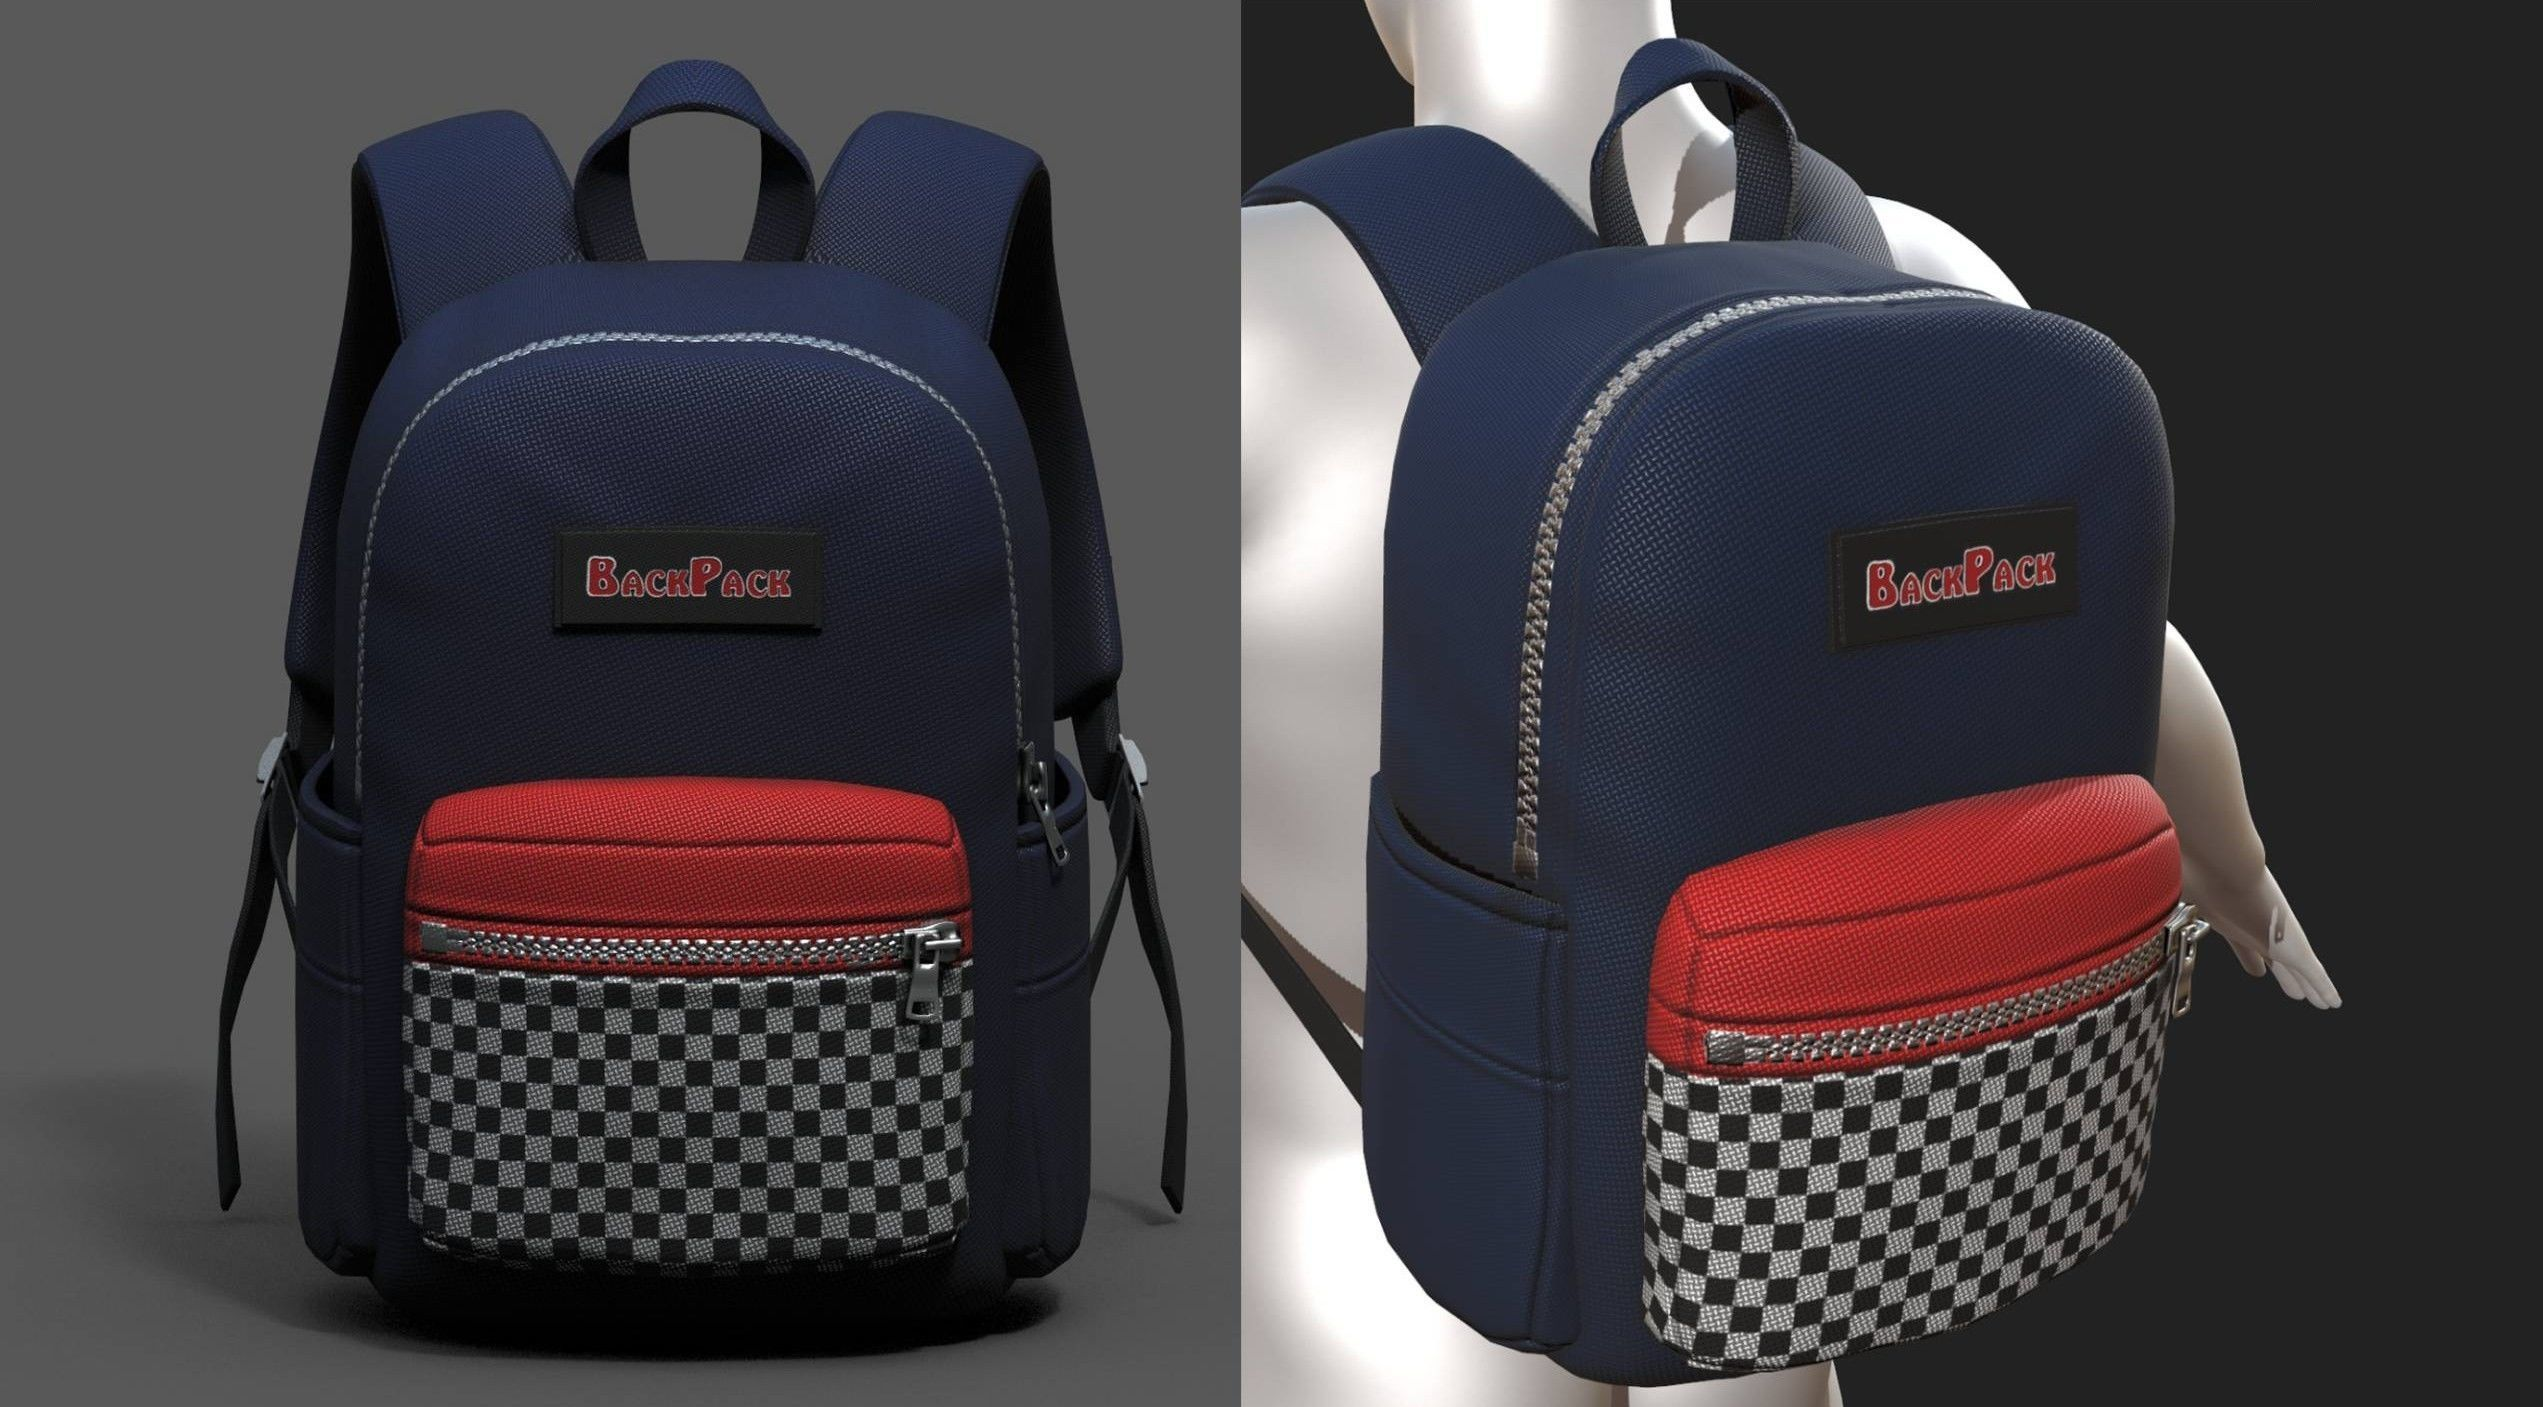 backpack-camping-bag-baggage-pockets-product-3d-model-low-poly-obj-fbx-ma | 3d artist